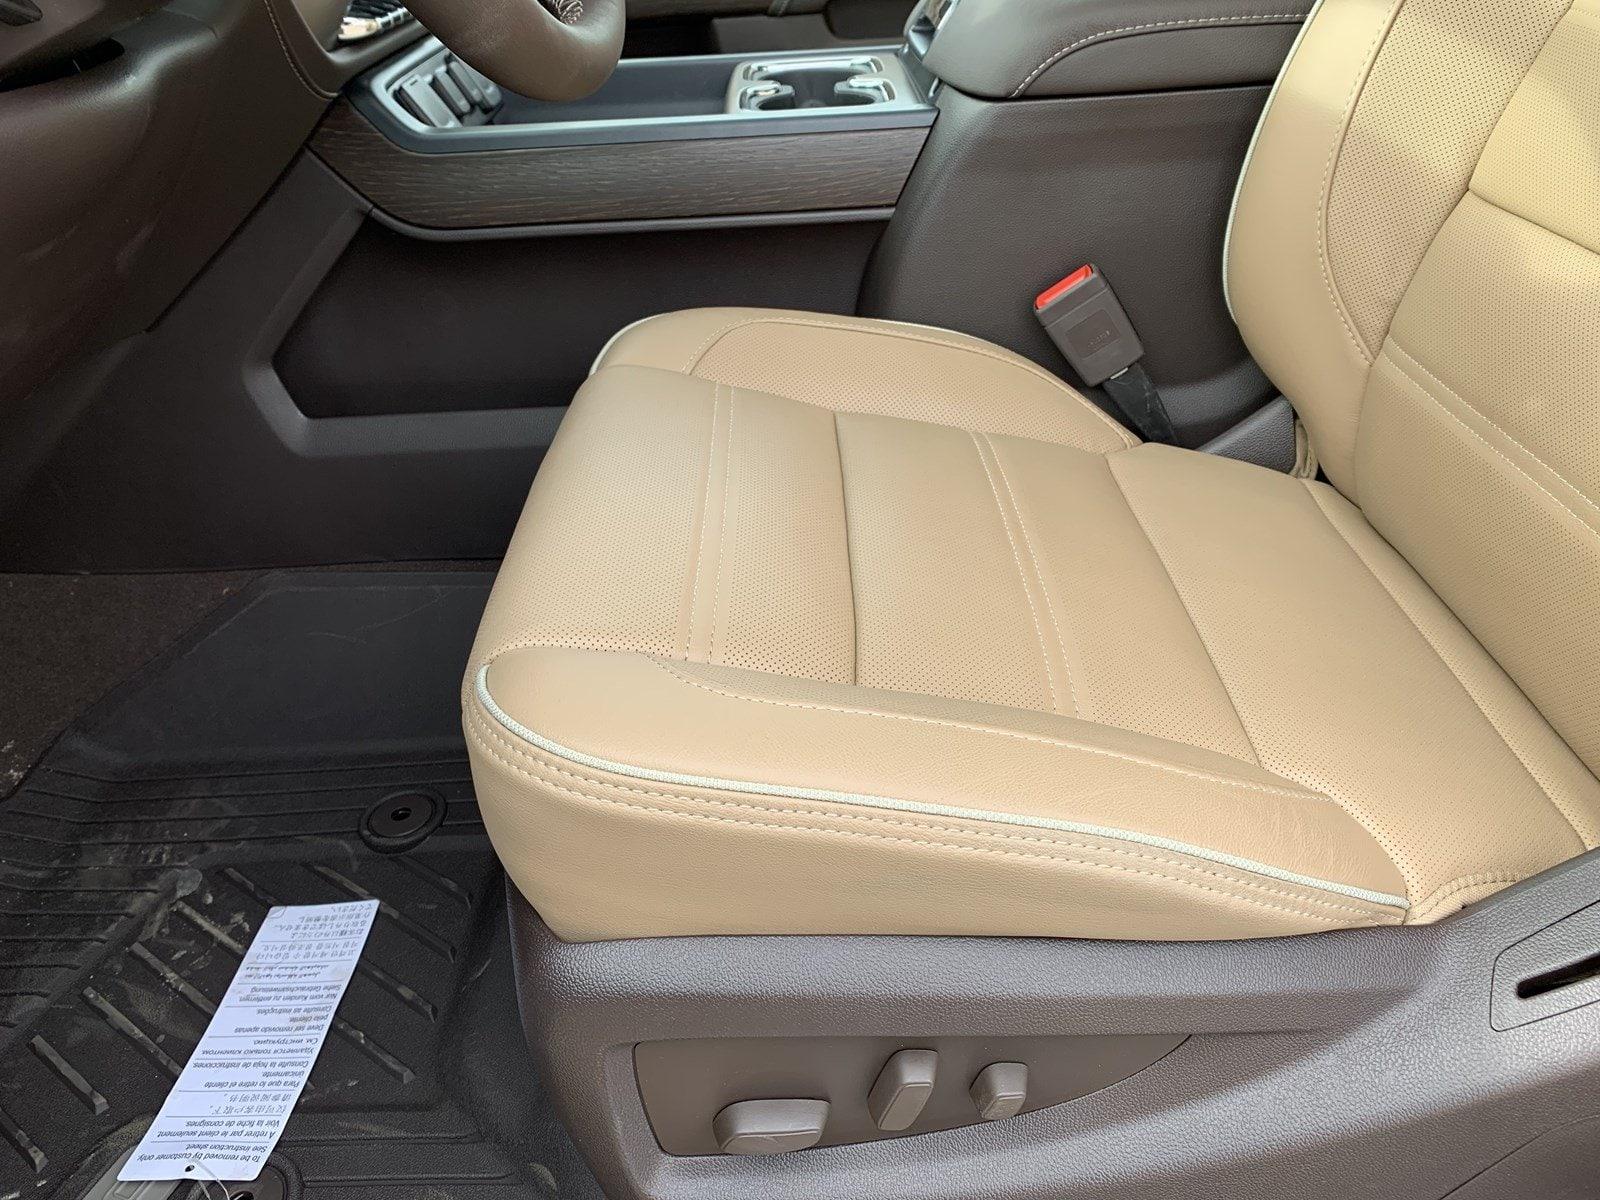 New 2019 GMC Sierra 3500HD For Sale at Johnson Auto Plaza